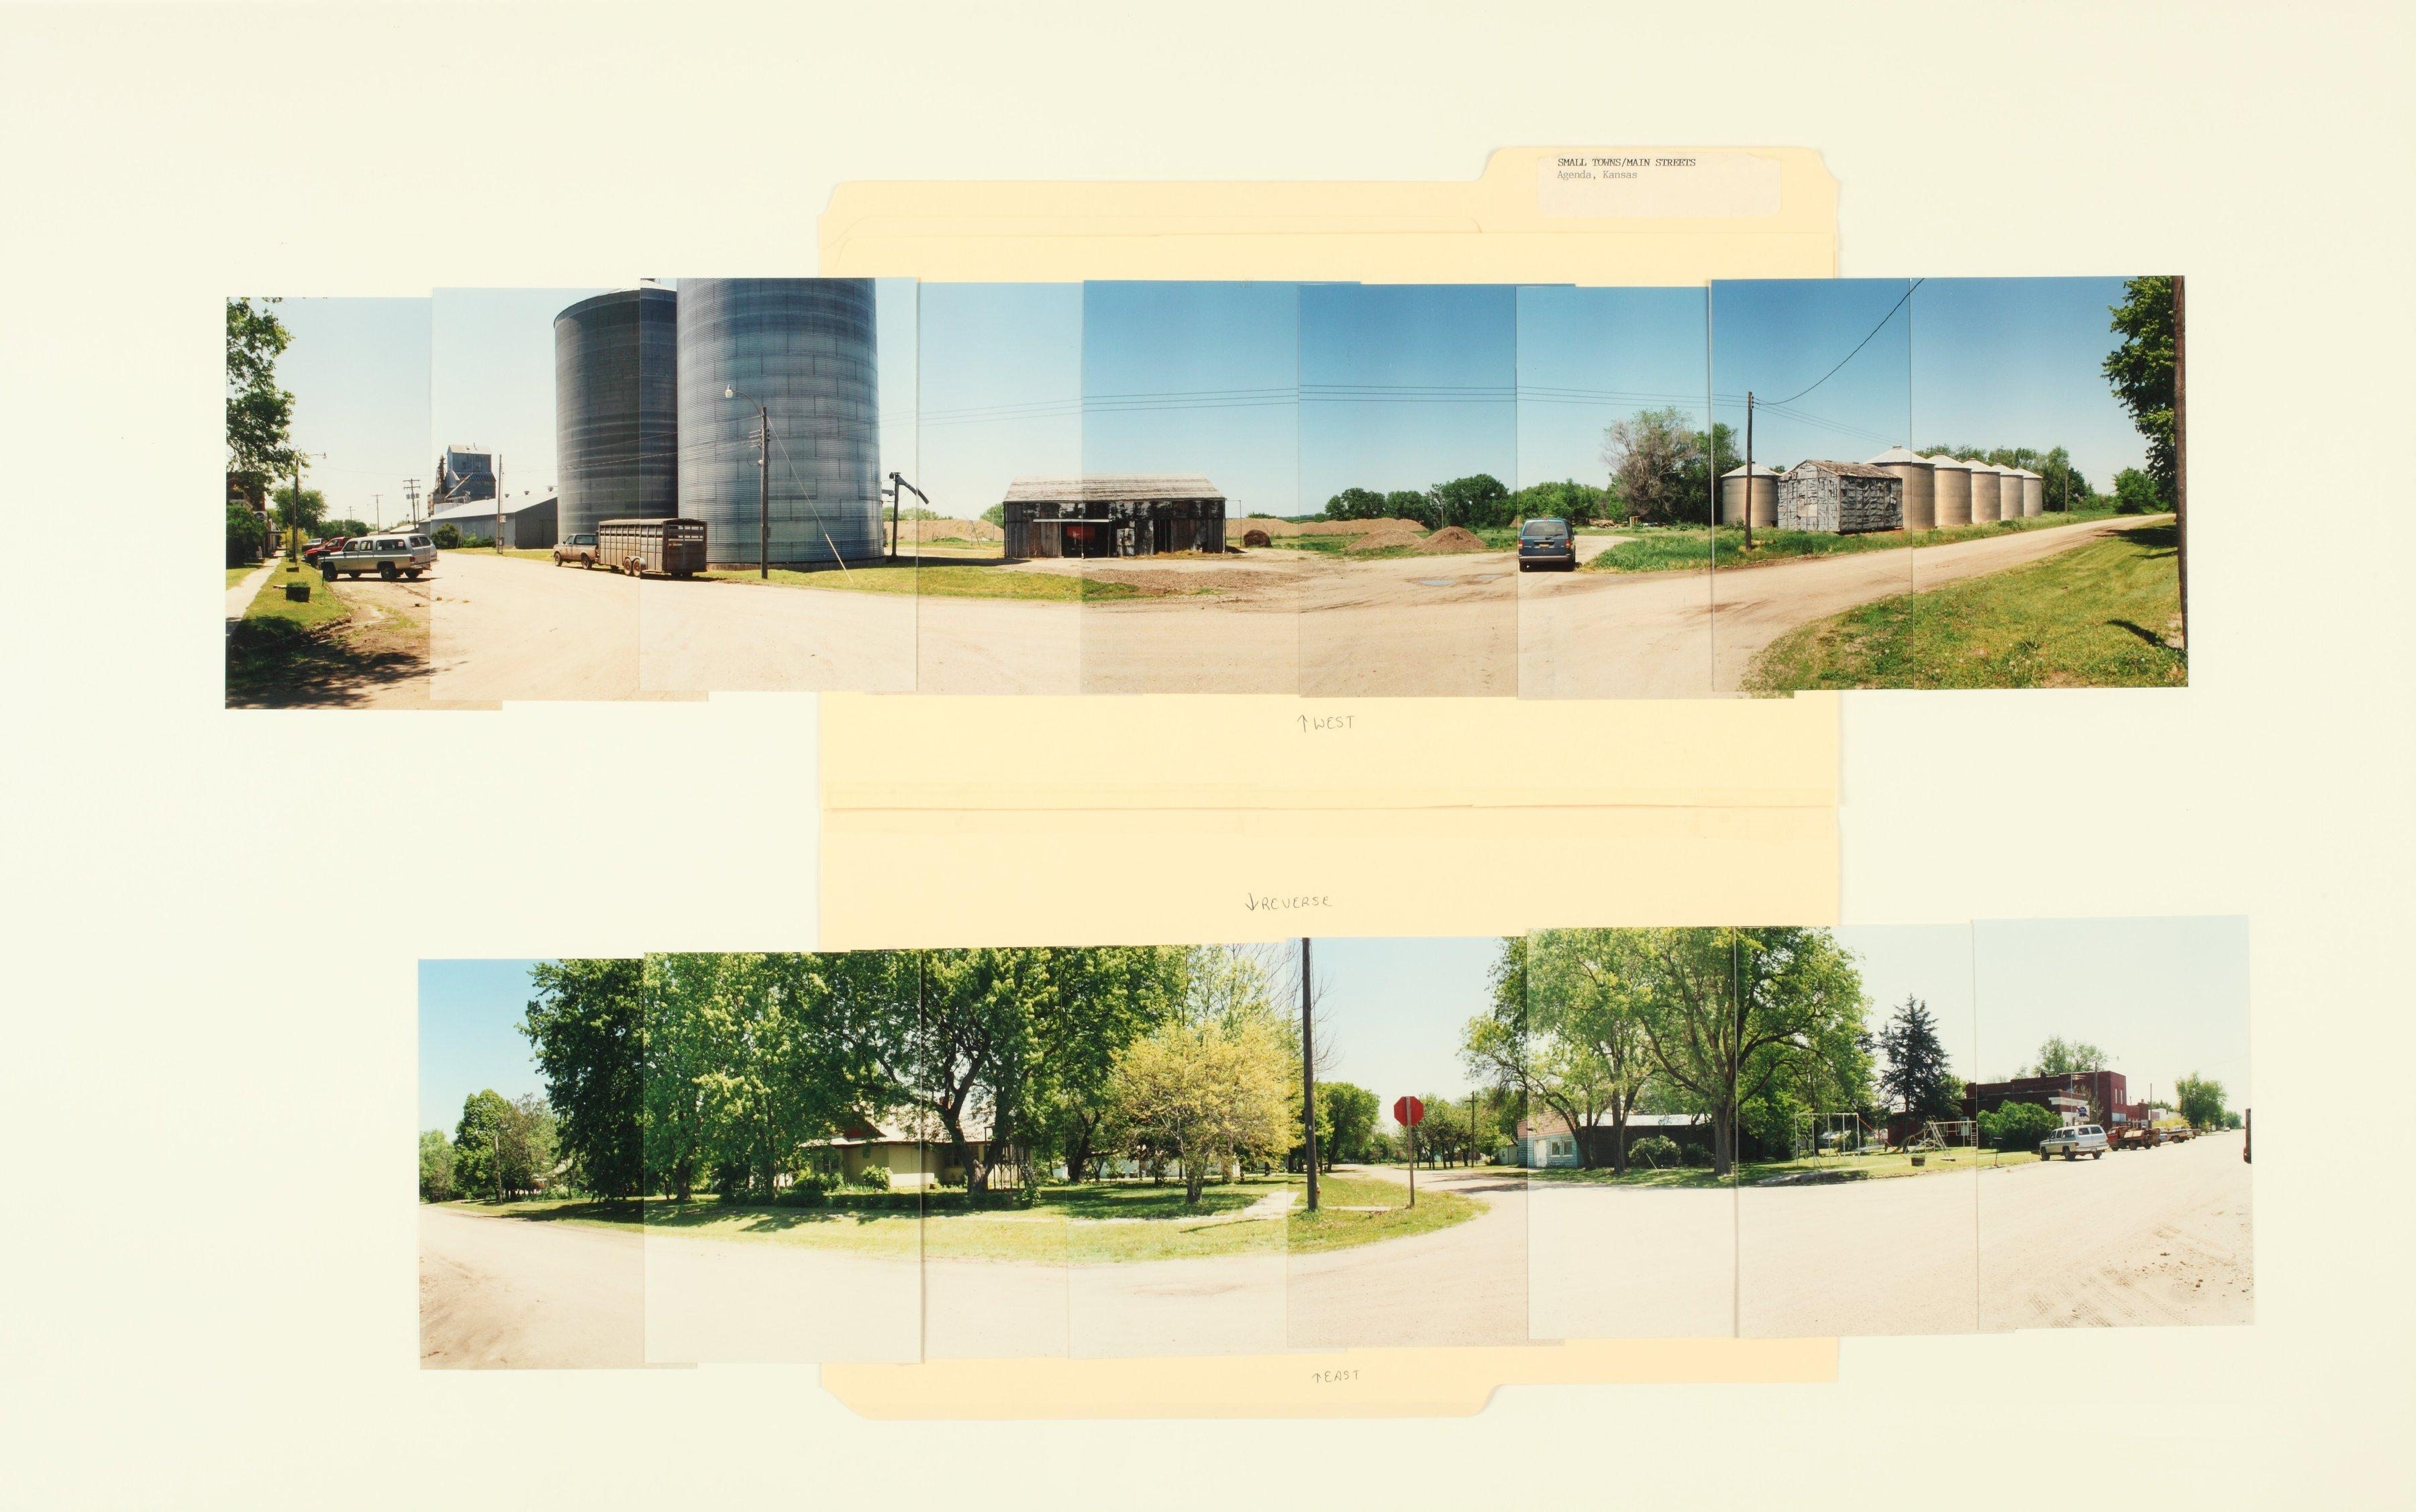 Kansas Film Commission site photographs, towns Ada - Bunker Hill - 6